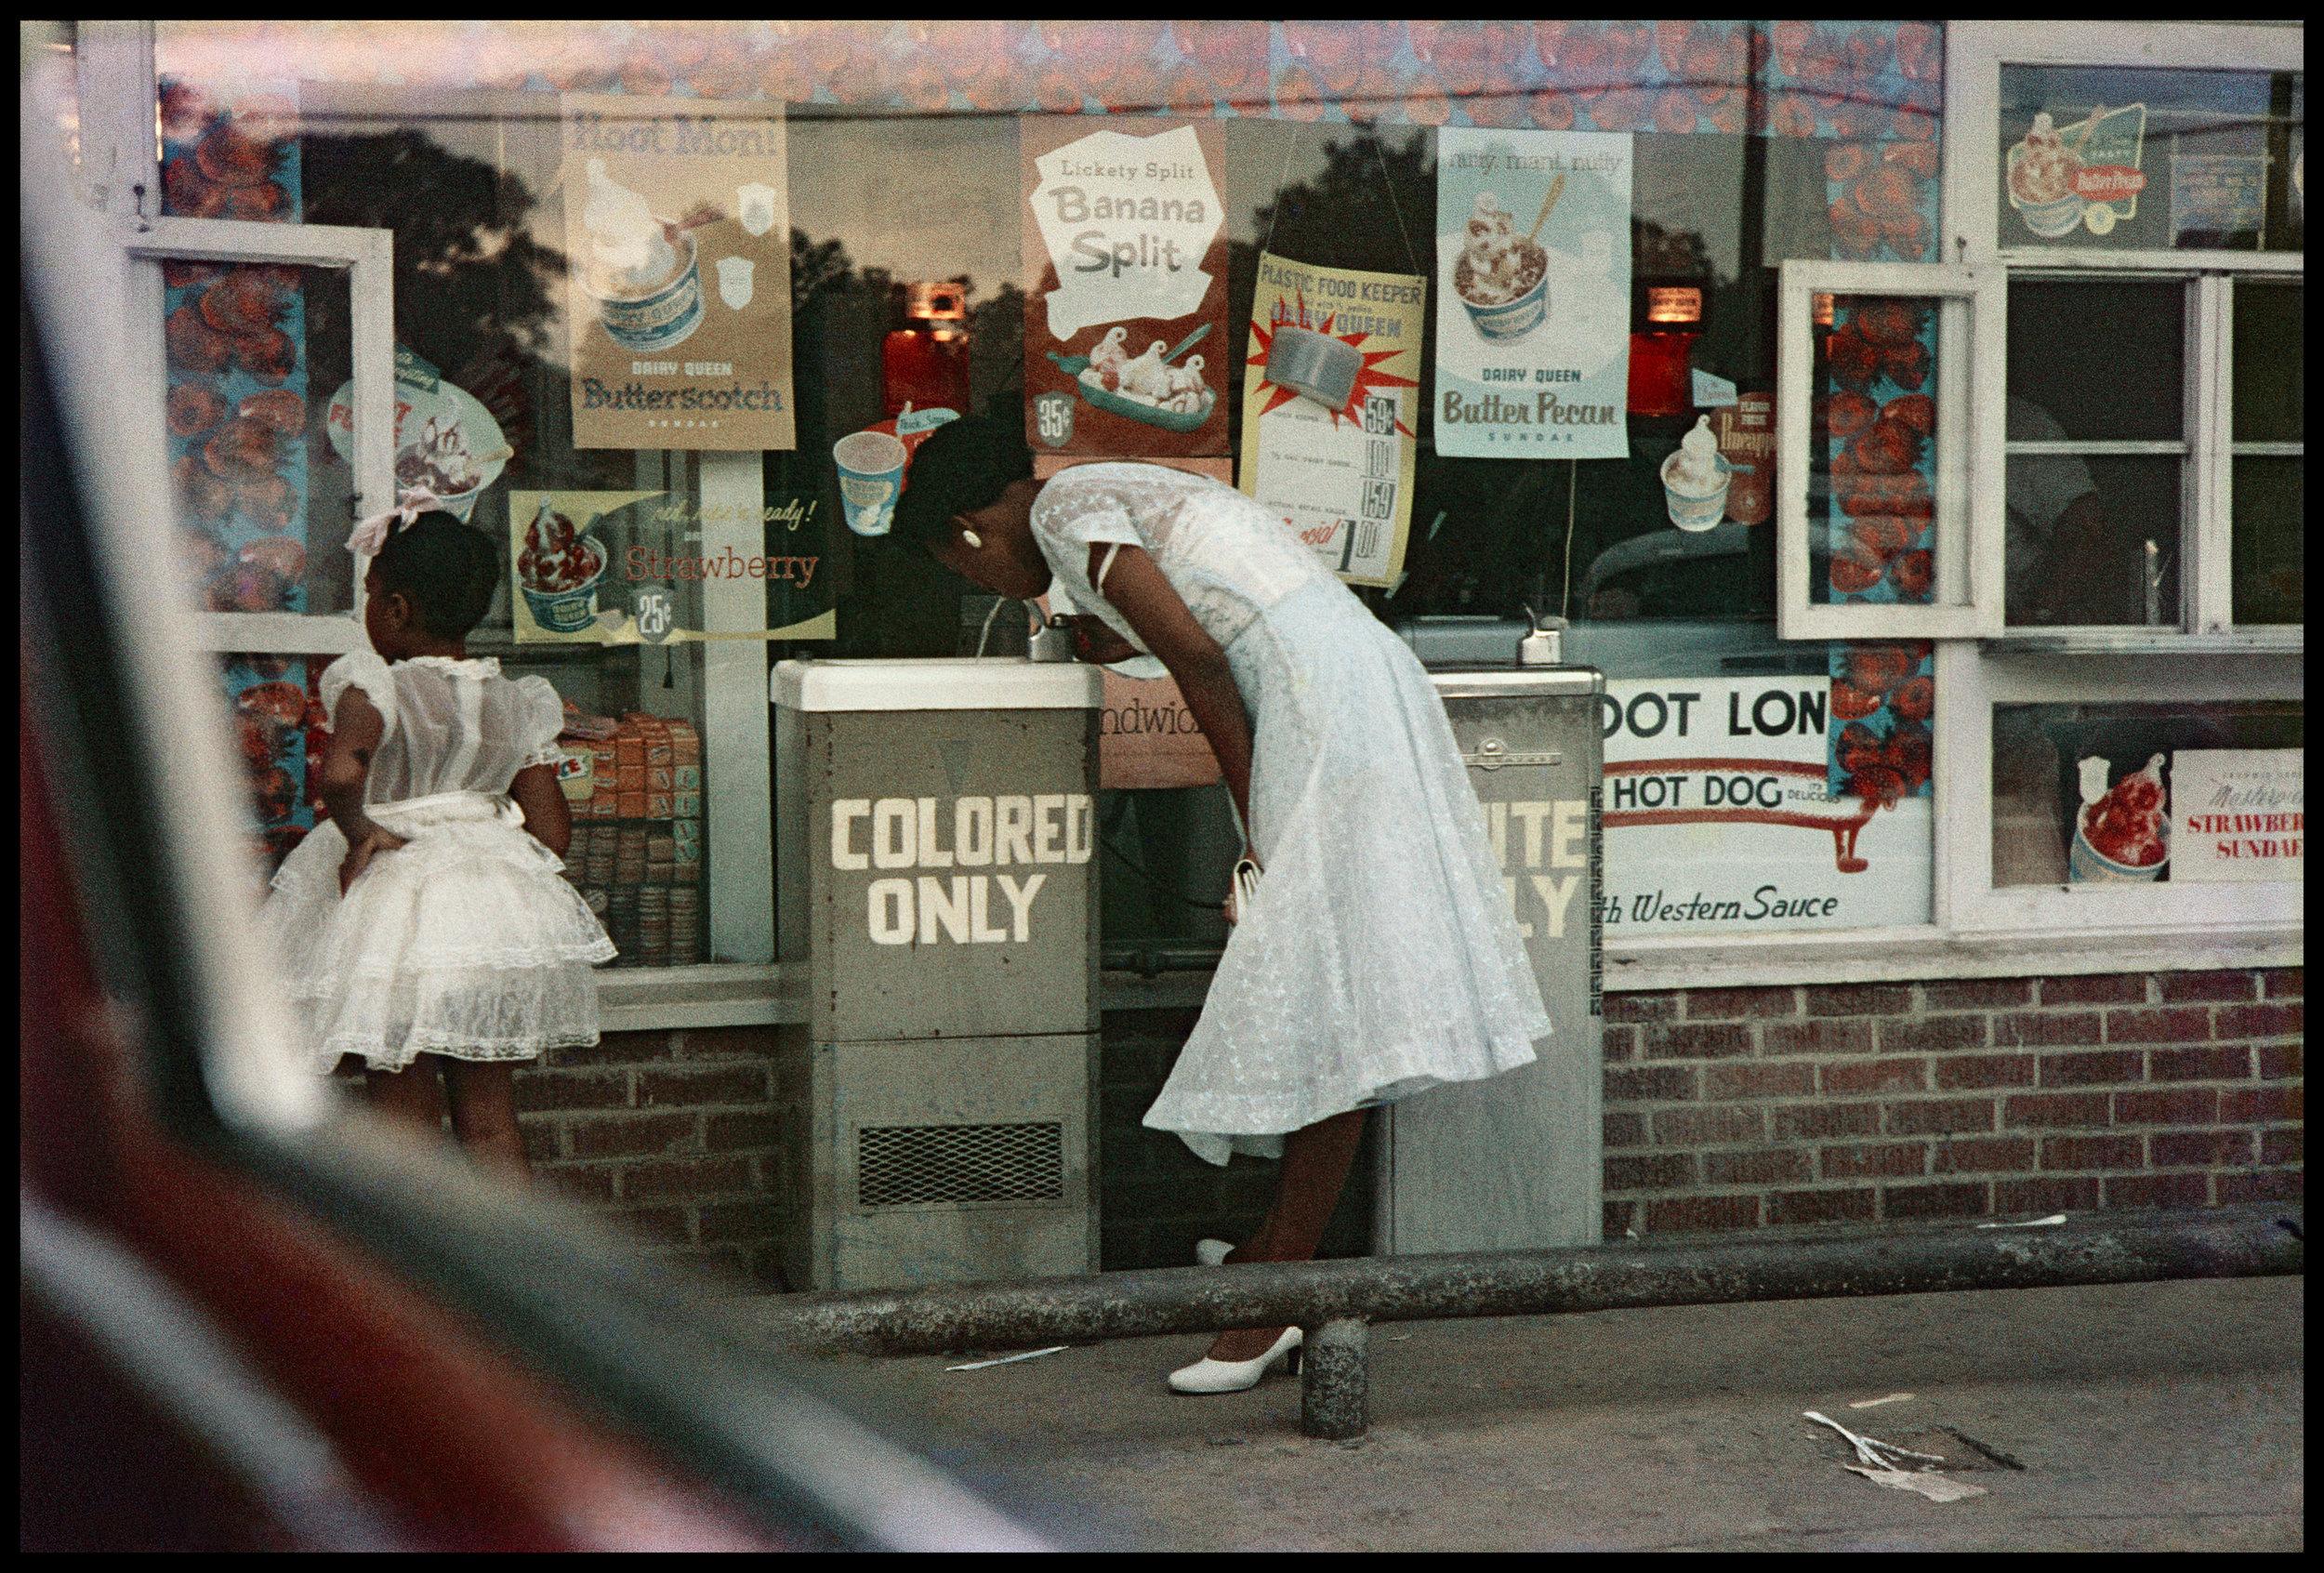 Drinking Foundations, Mobile, Alabama, 1956